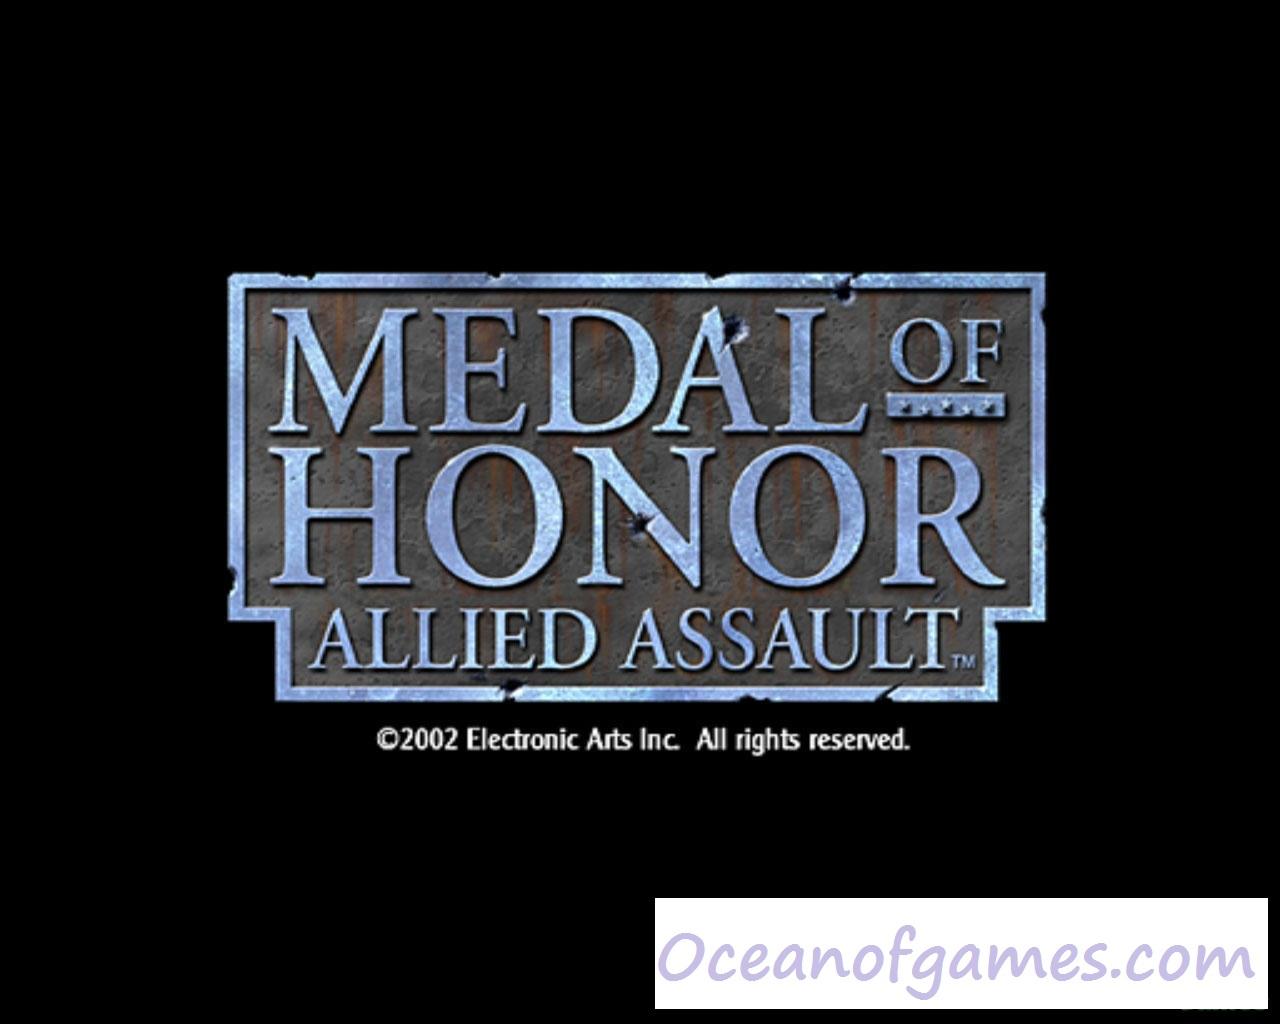 تحميل لعبة ميدل برابط مباشر مجاناً 183974-medal-of-honor-allied-assault-windows-screenshot-startup-screens